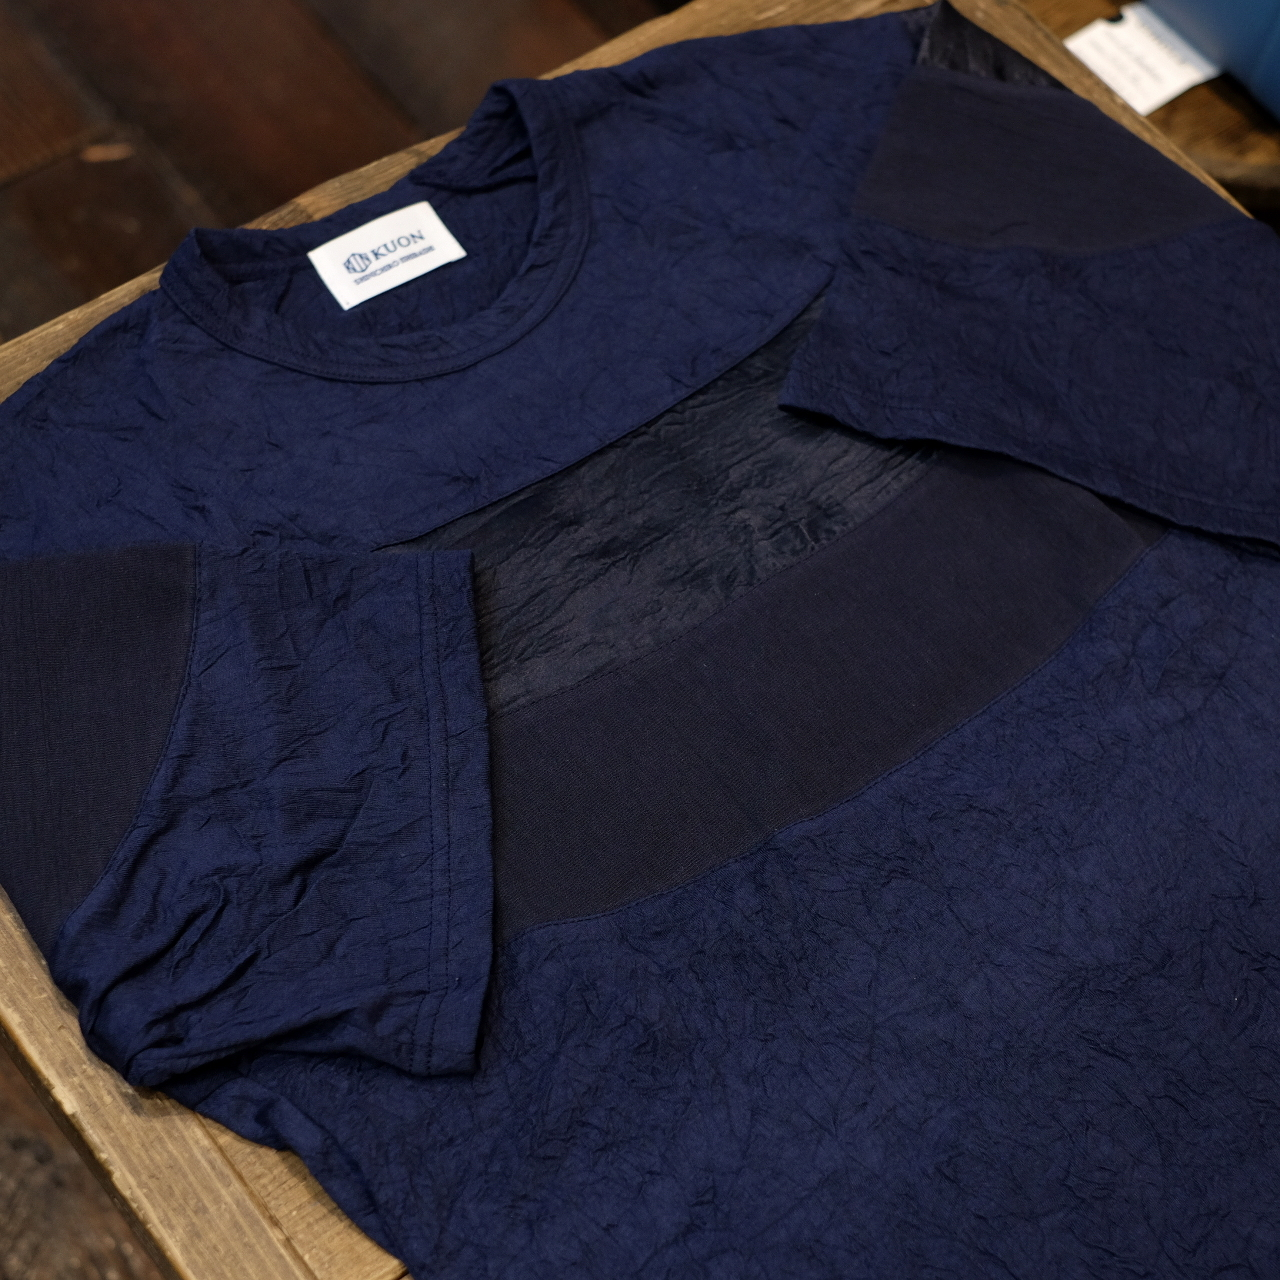 KUON(クオン) 和紙クレープ・アセテート キャップショルダーリンクルTシャツ ネイビー